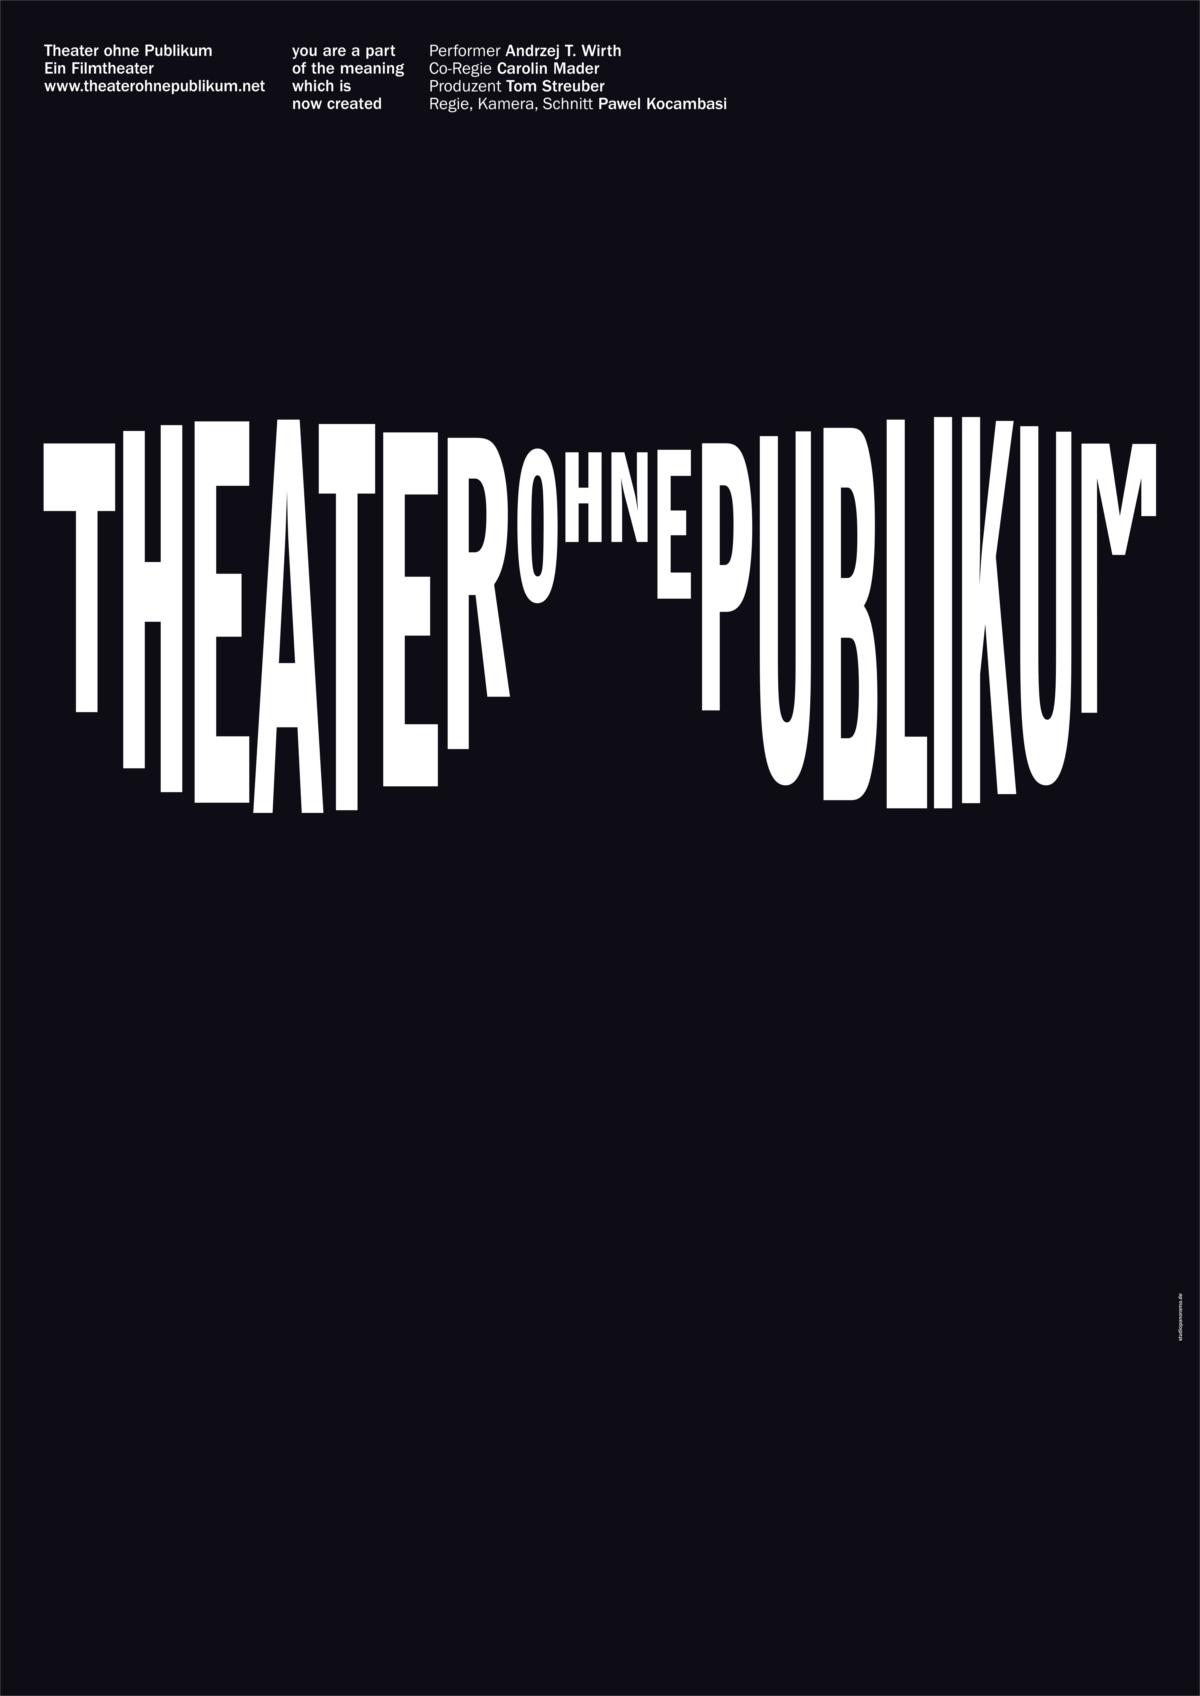 2016_Theater_ohne_Publikum_Knudsen_Streuber_Medienmanufaktur.jpeg